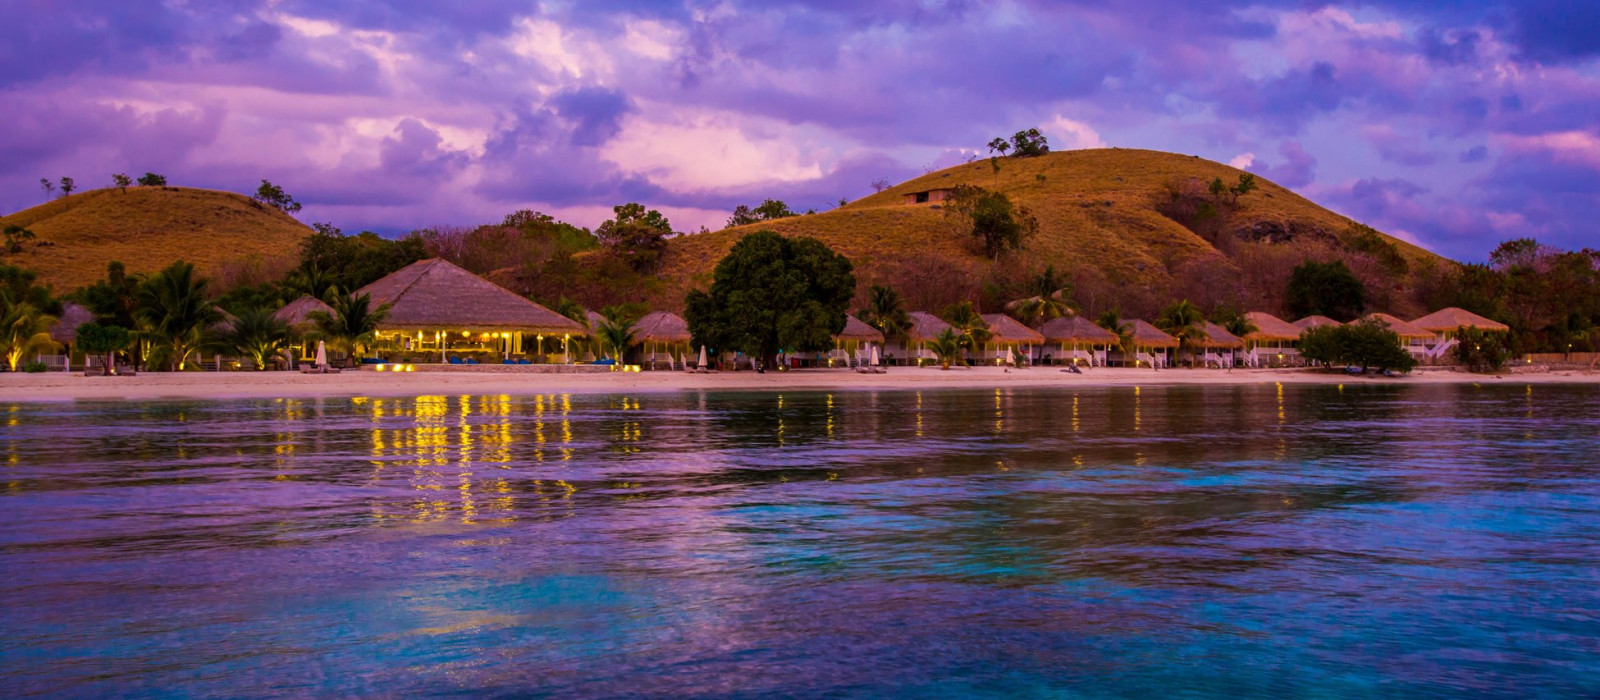 Hotel Sudamala Resorts, Seraya Indonesien